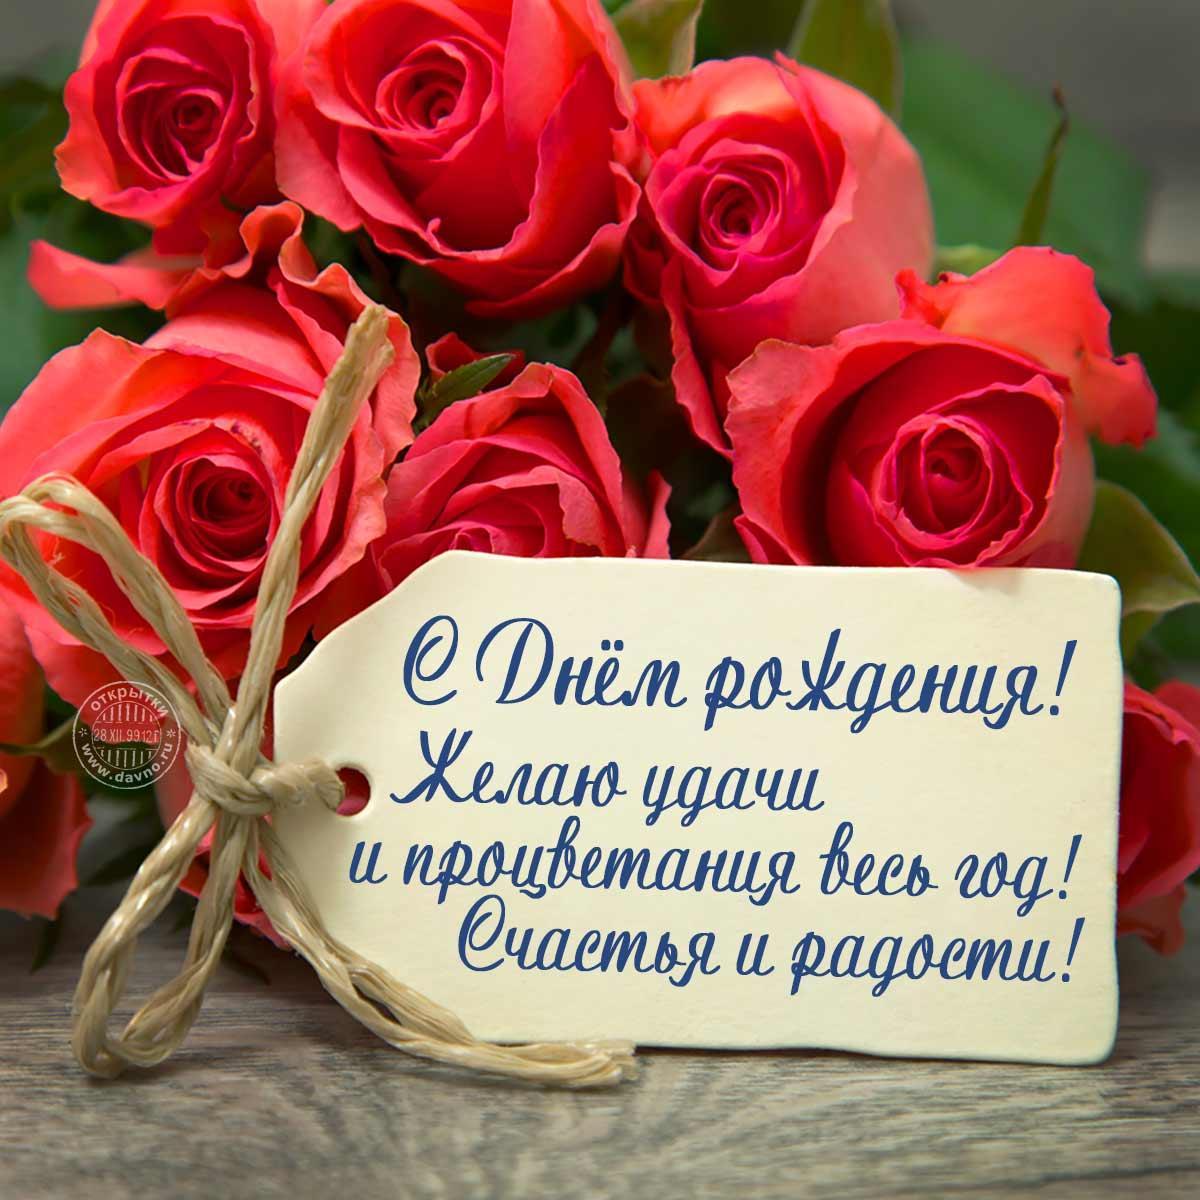 С днем рождения подруге/ фото www.davno.ru